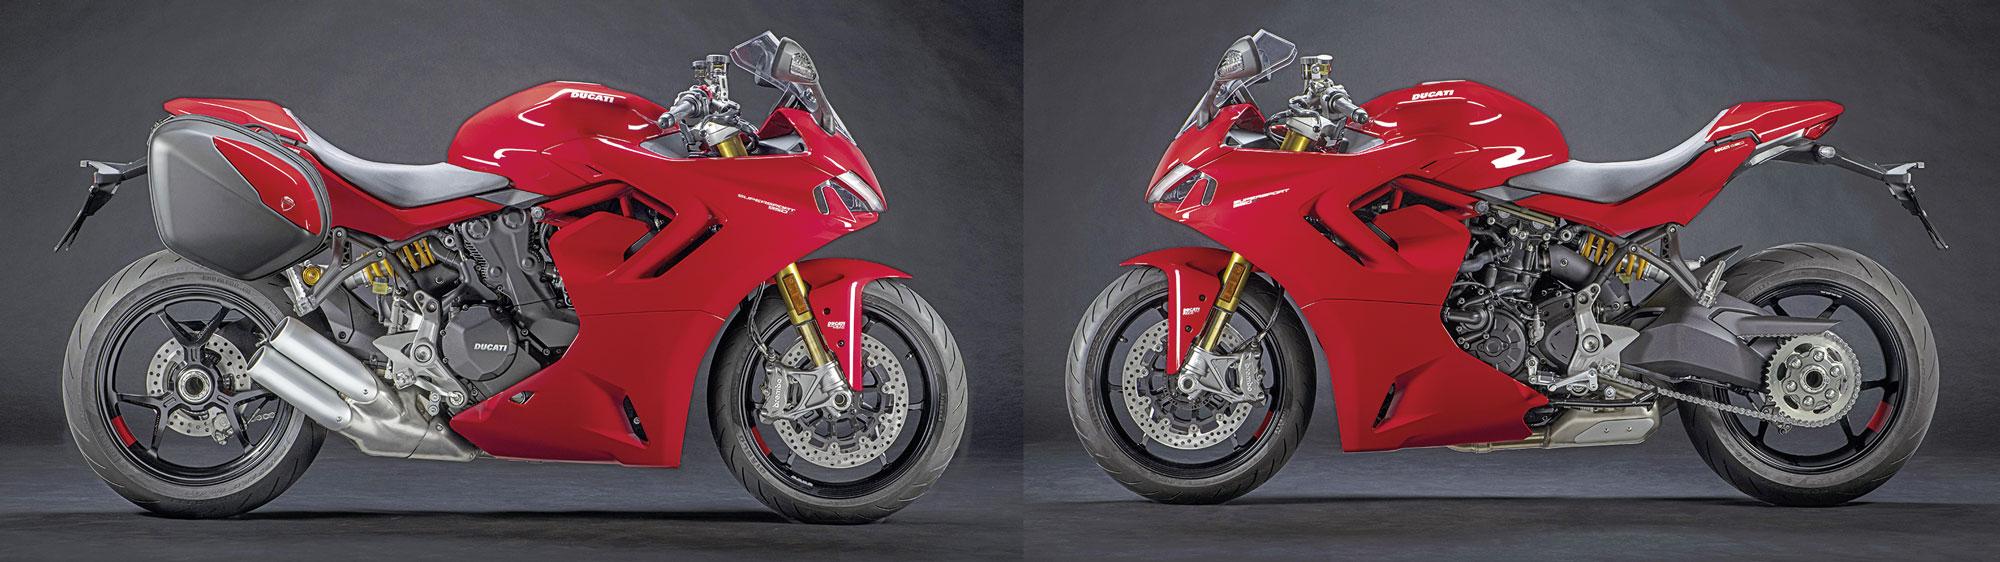 Koffersatz Ducati Supersport 950 S, Modell 2021